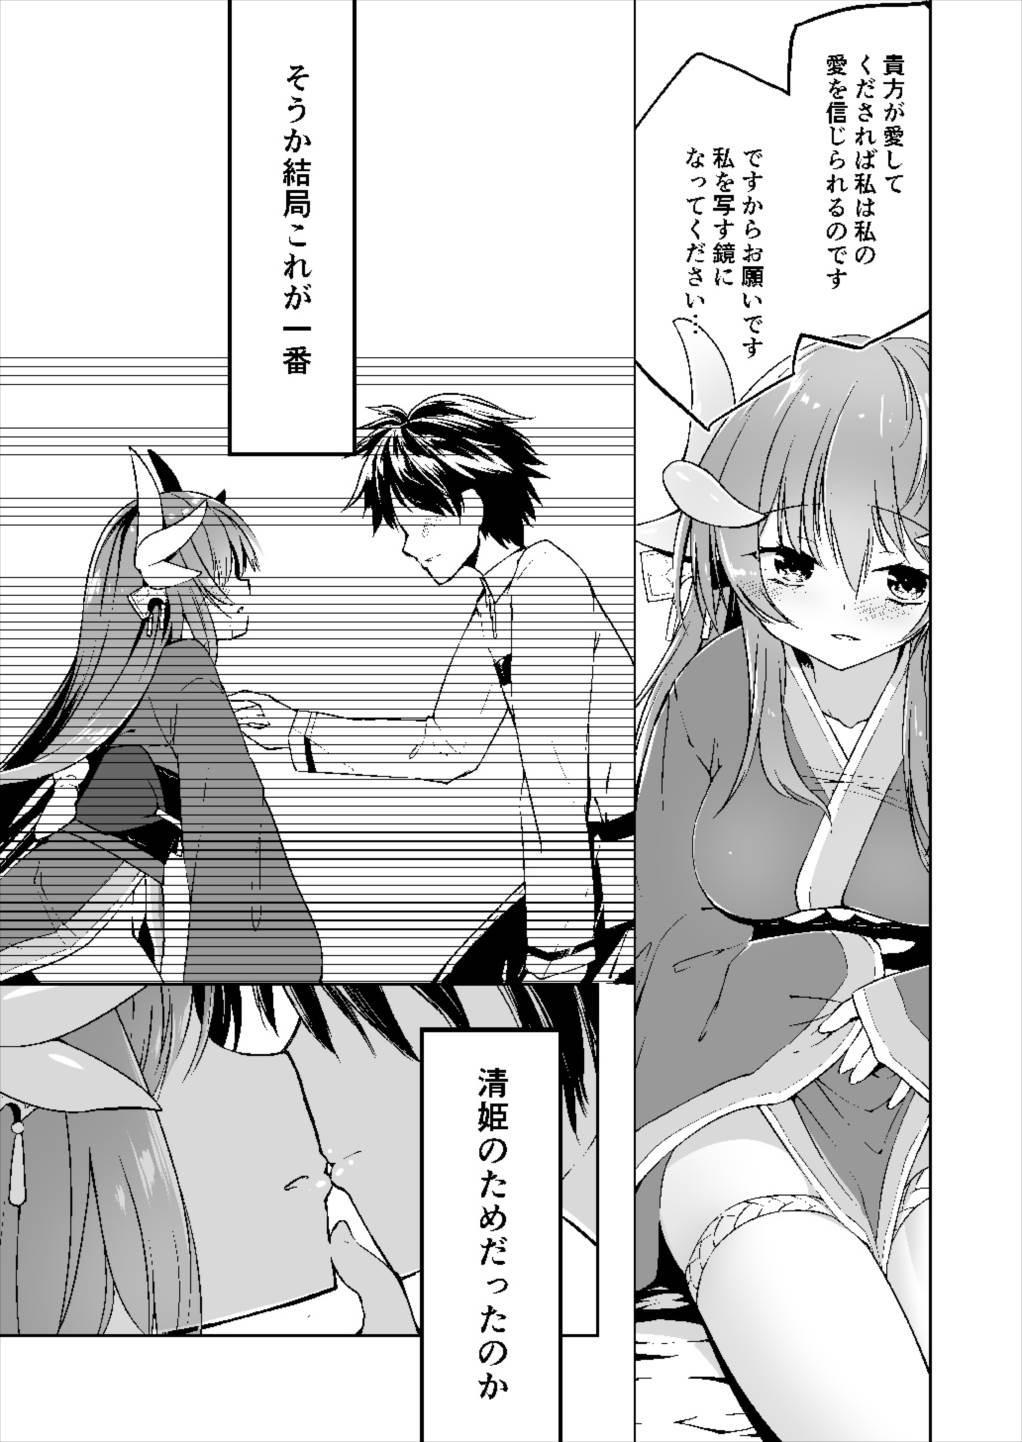 Kiyohime Lovers Vol. 01 - Kiyohime to Hajimete 6